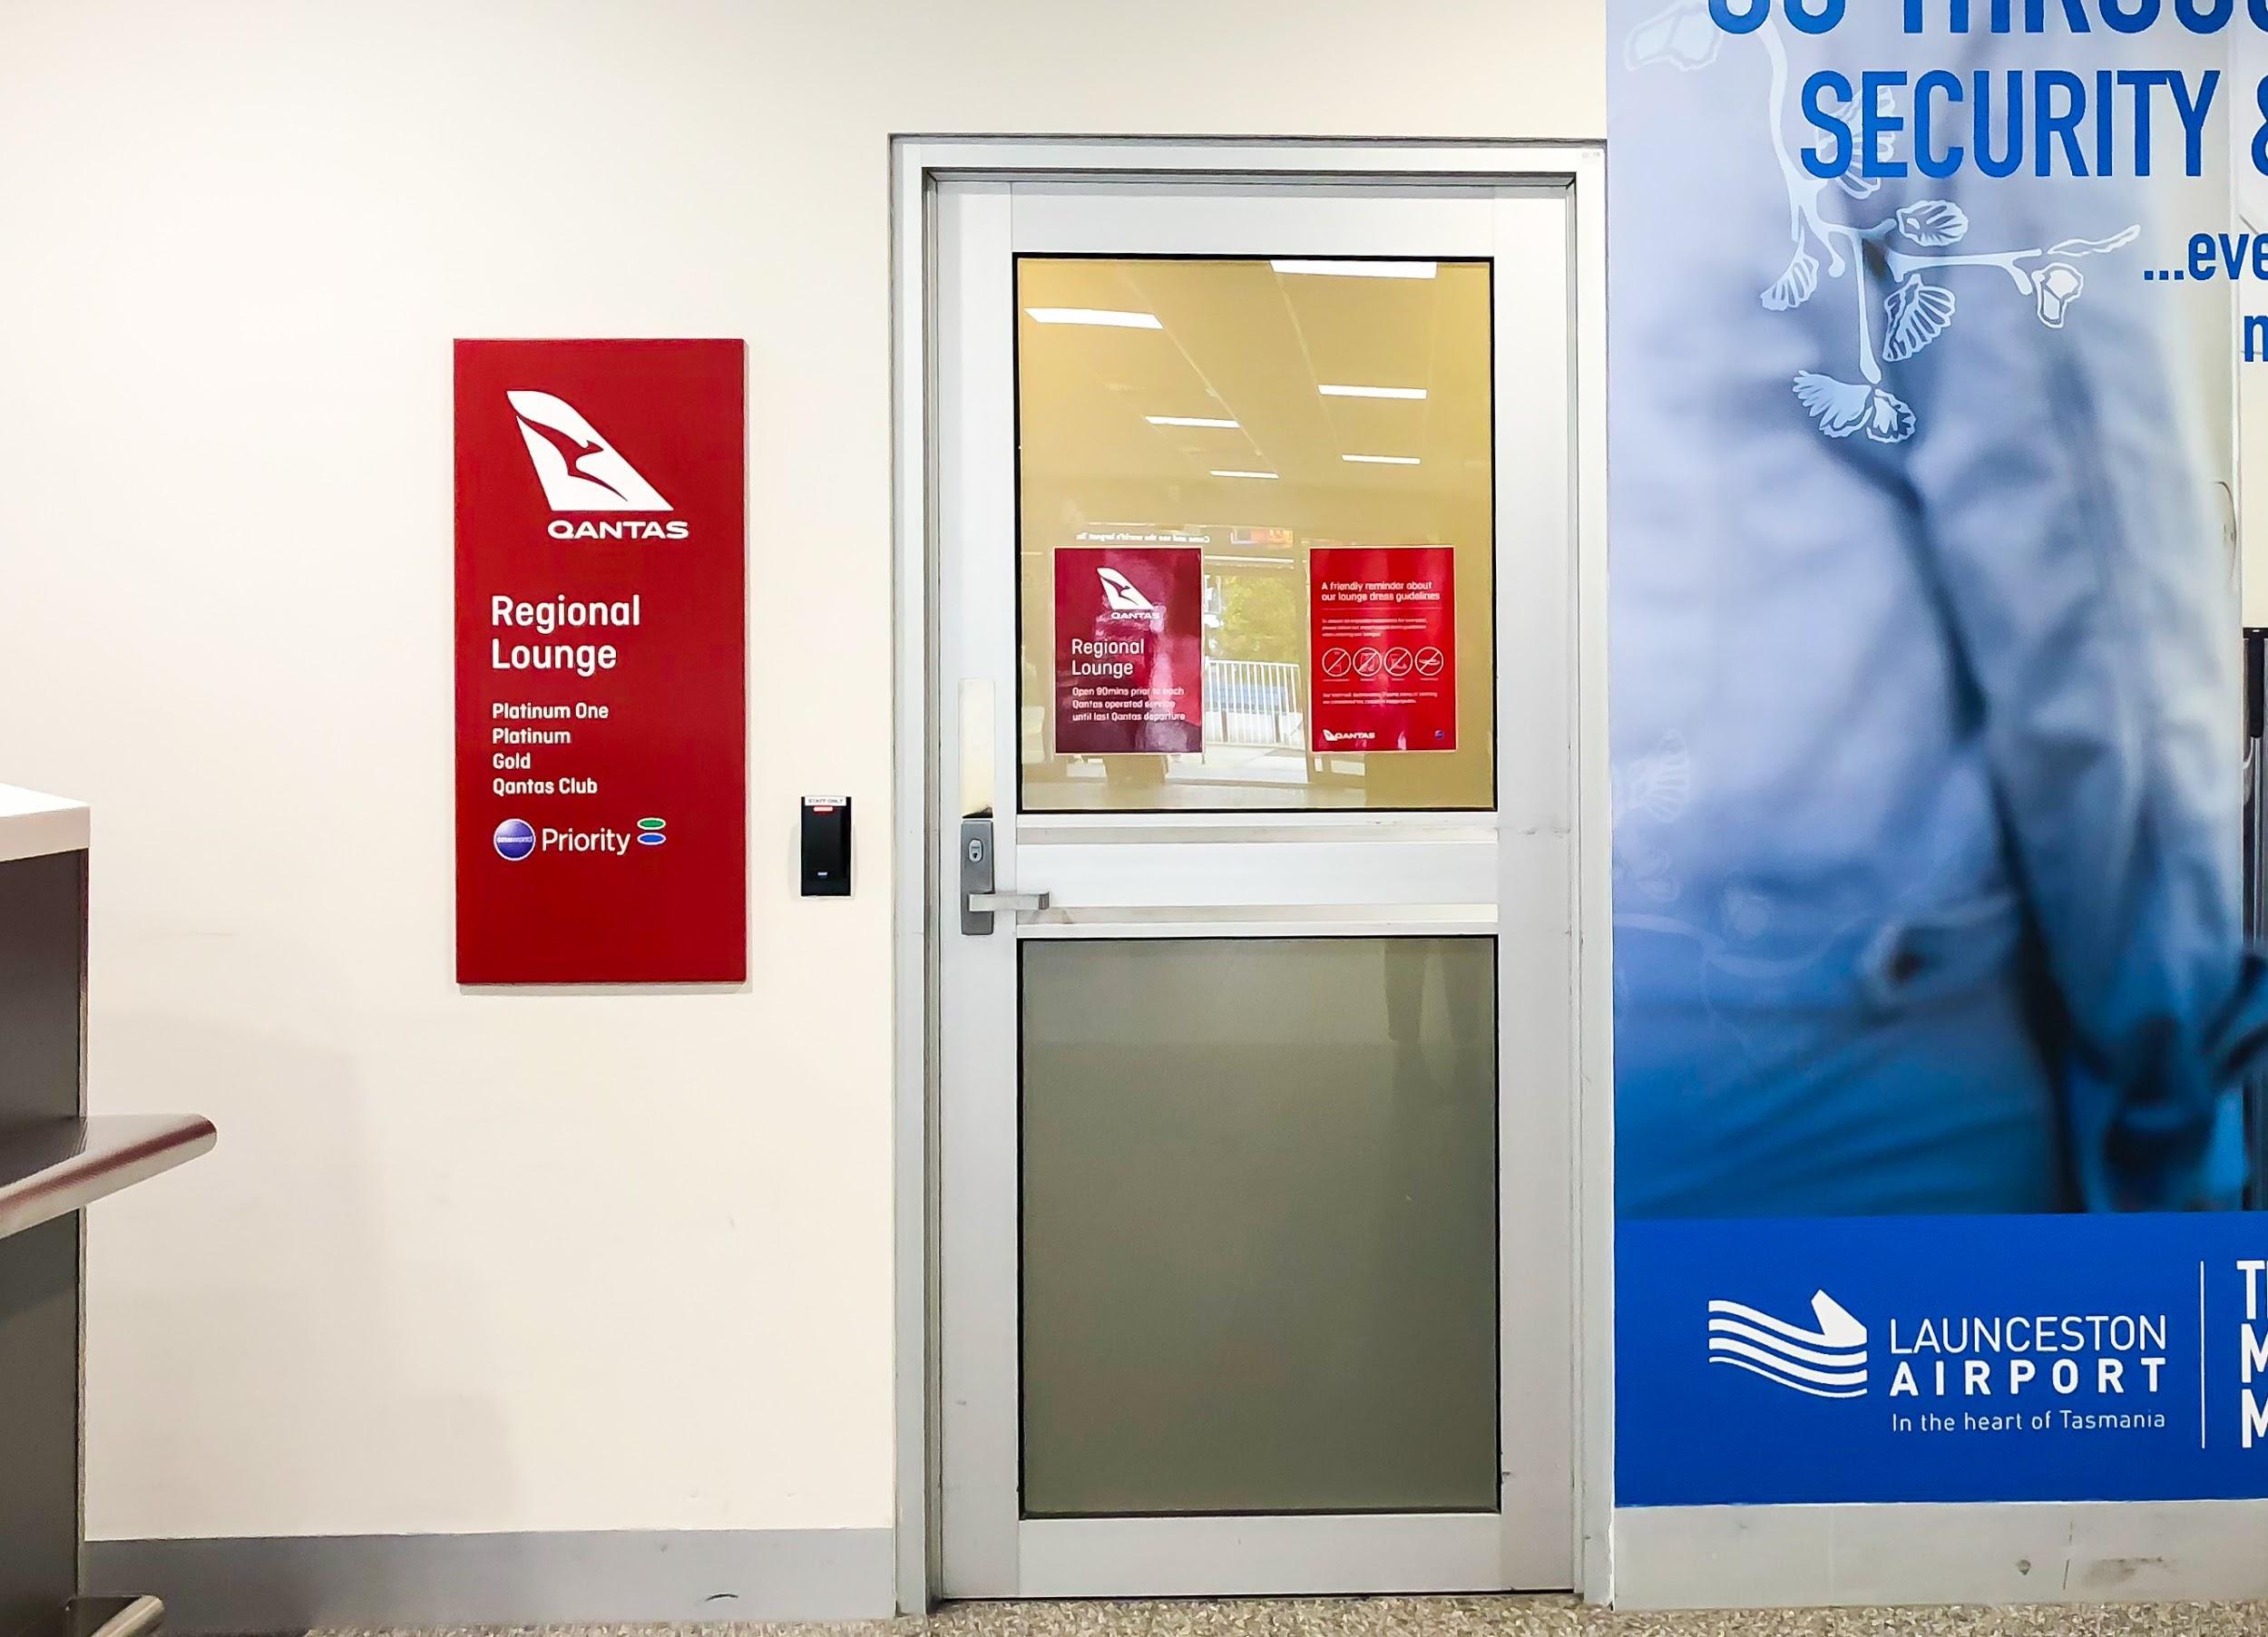 Qantas Regional Lounge Launceston